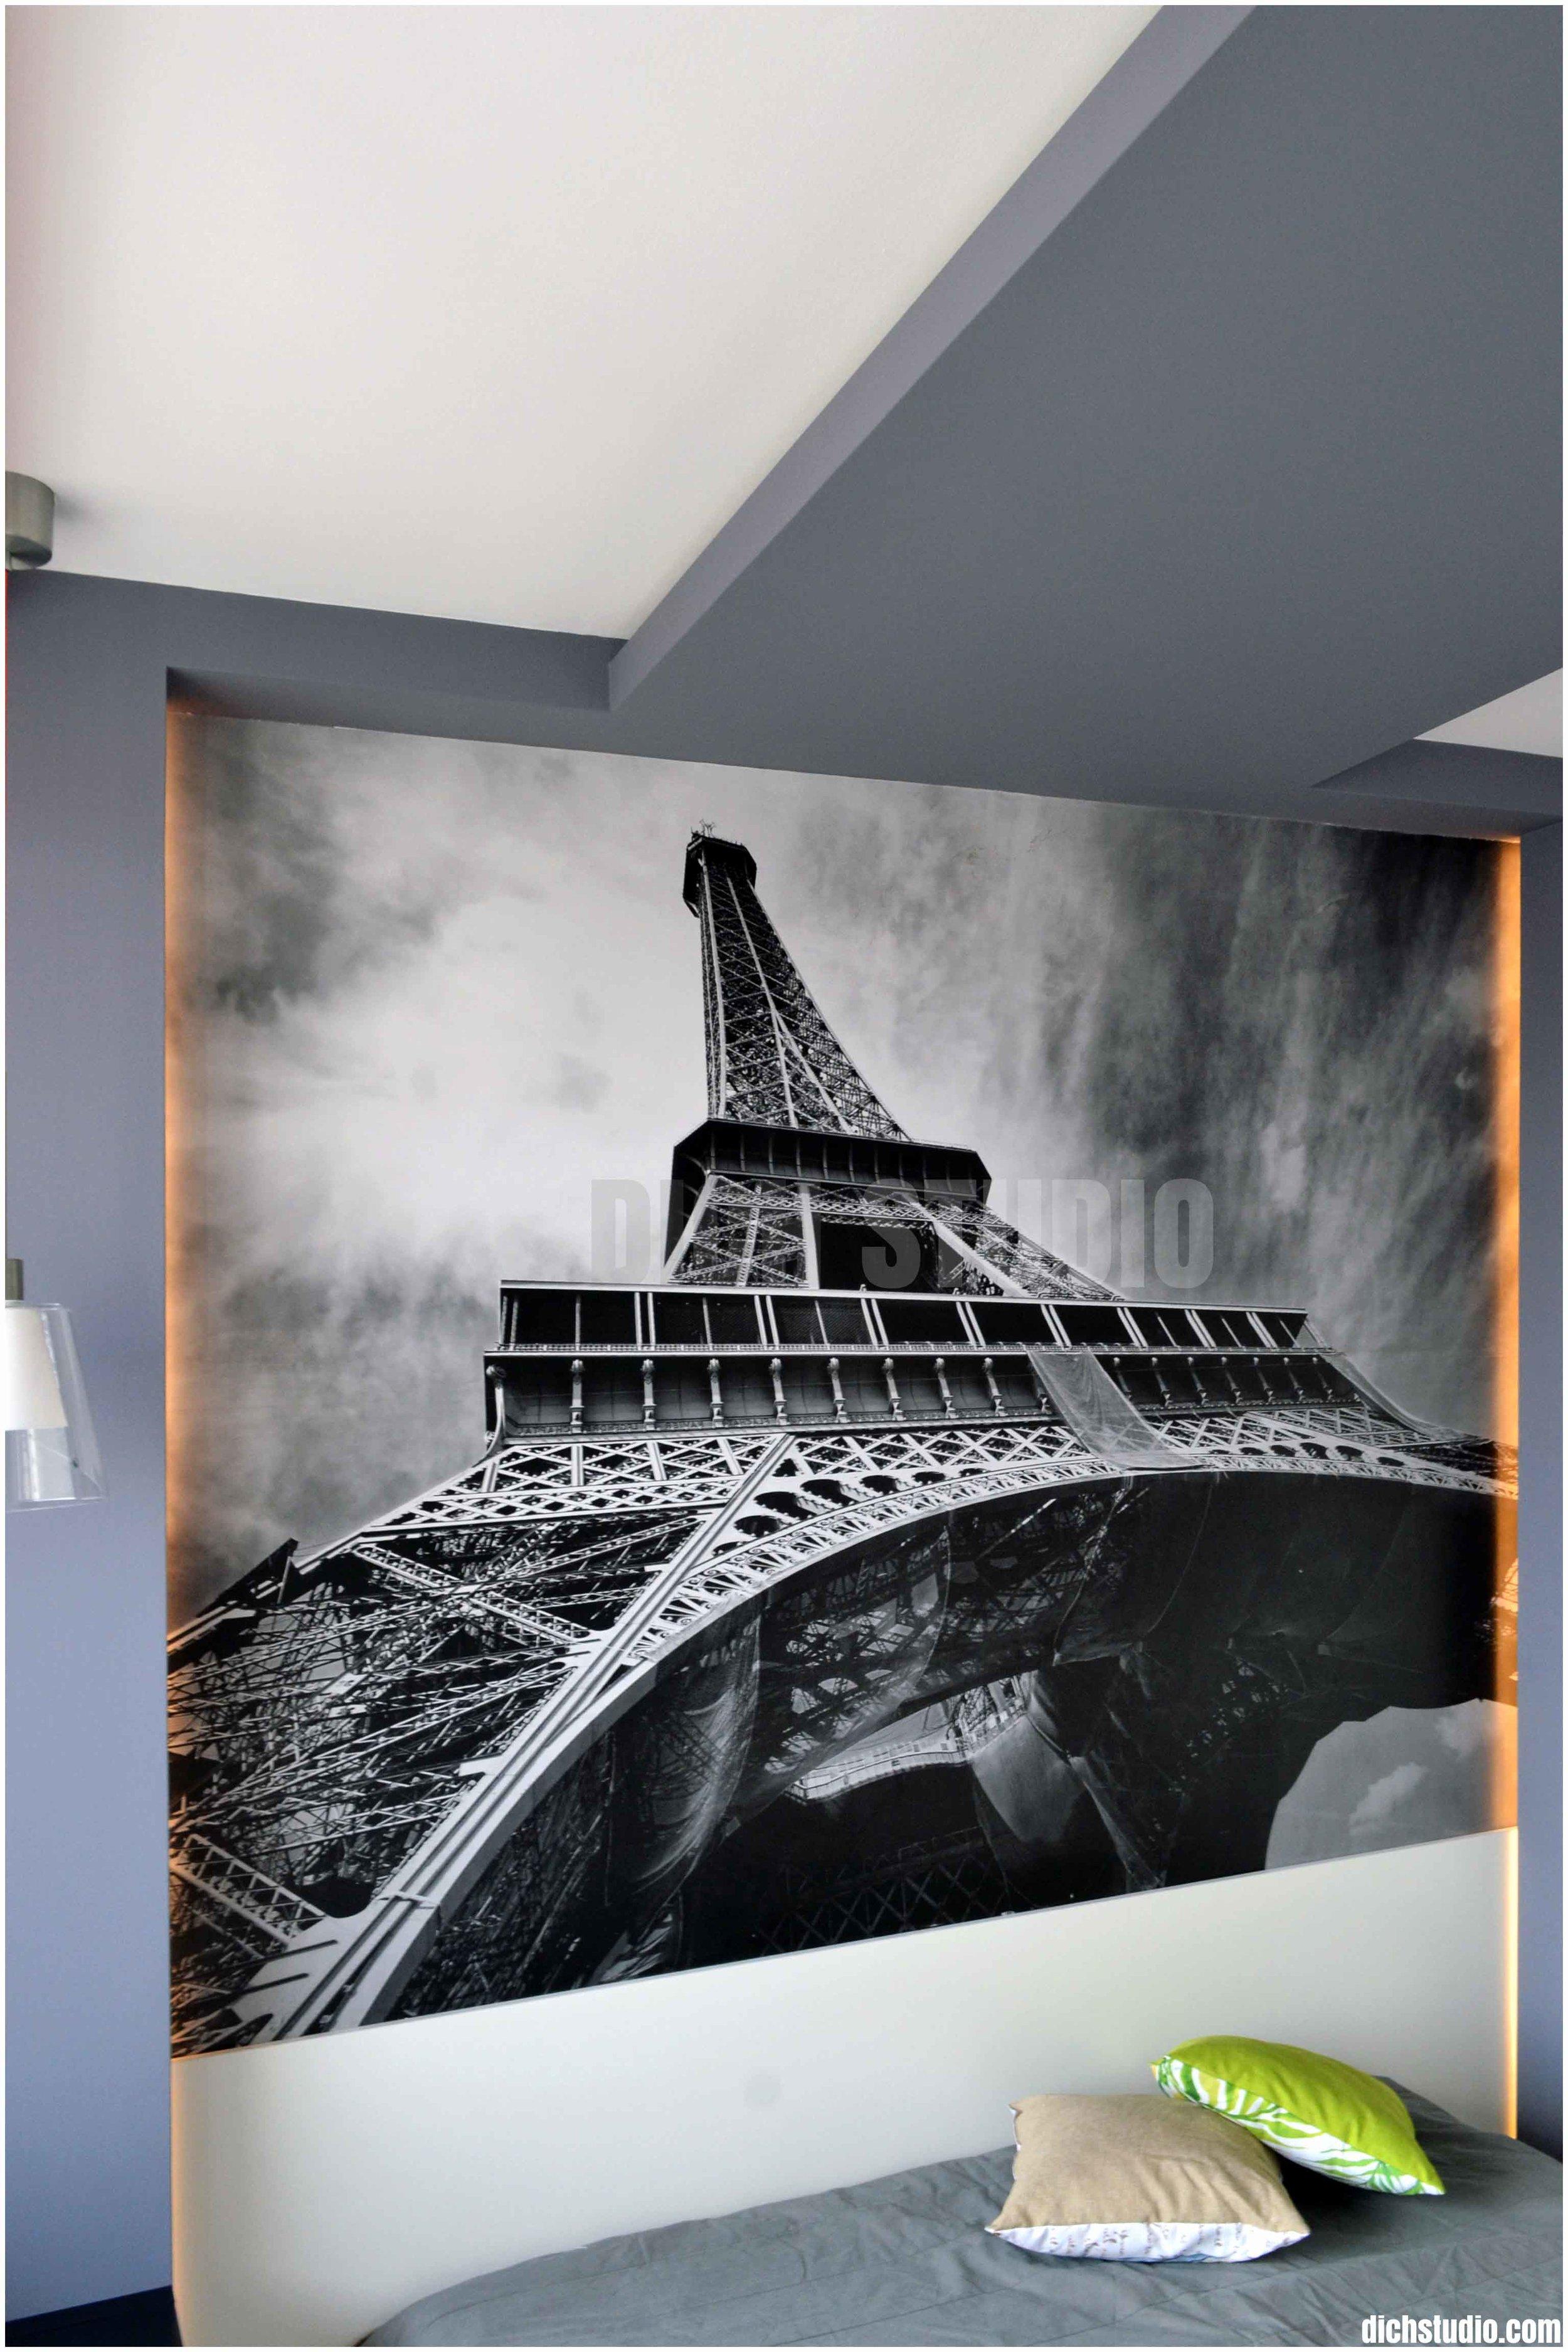 Bedroom design - completed work